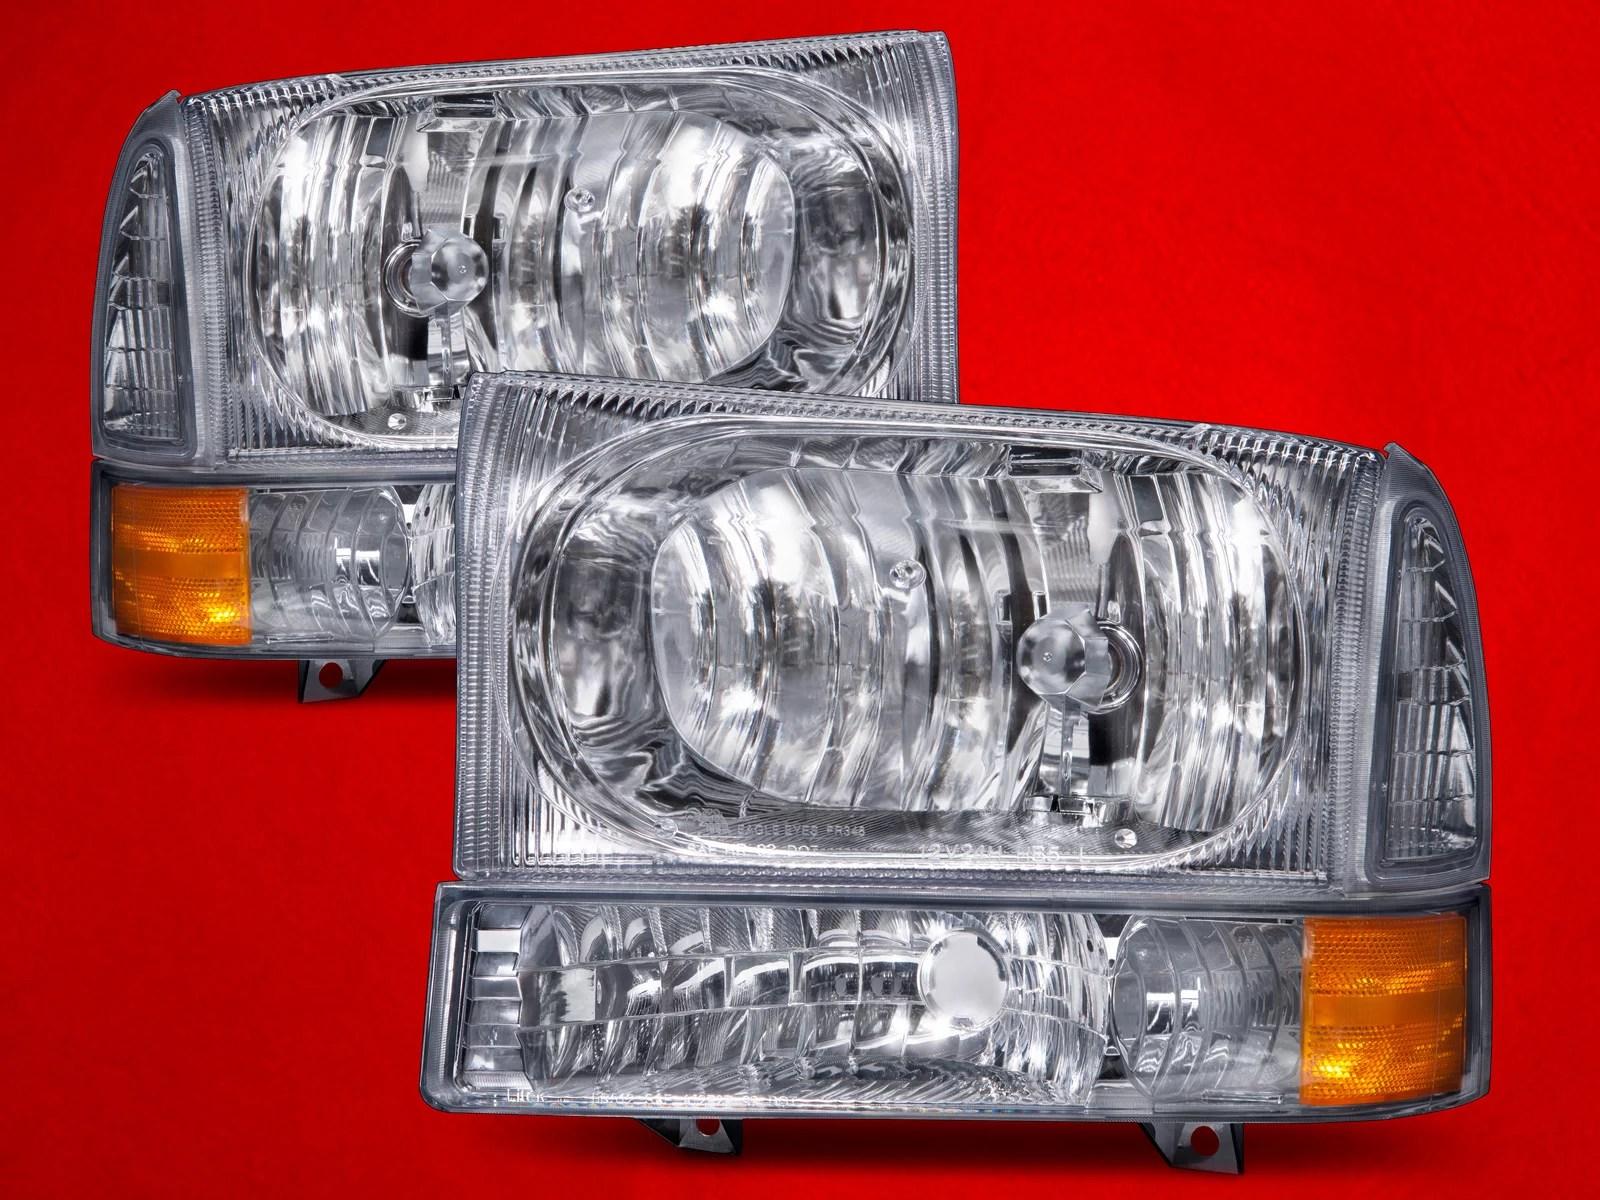 hight resolution of ford 1999 04 f 250 f 350 f 450 superduty excursion chrome headlights set w signal lights fo2502183 fo2503183 walmart com